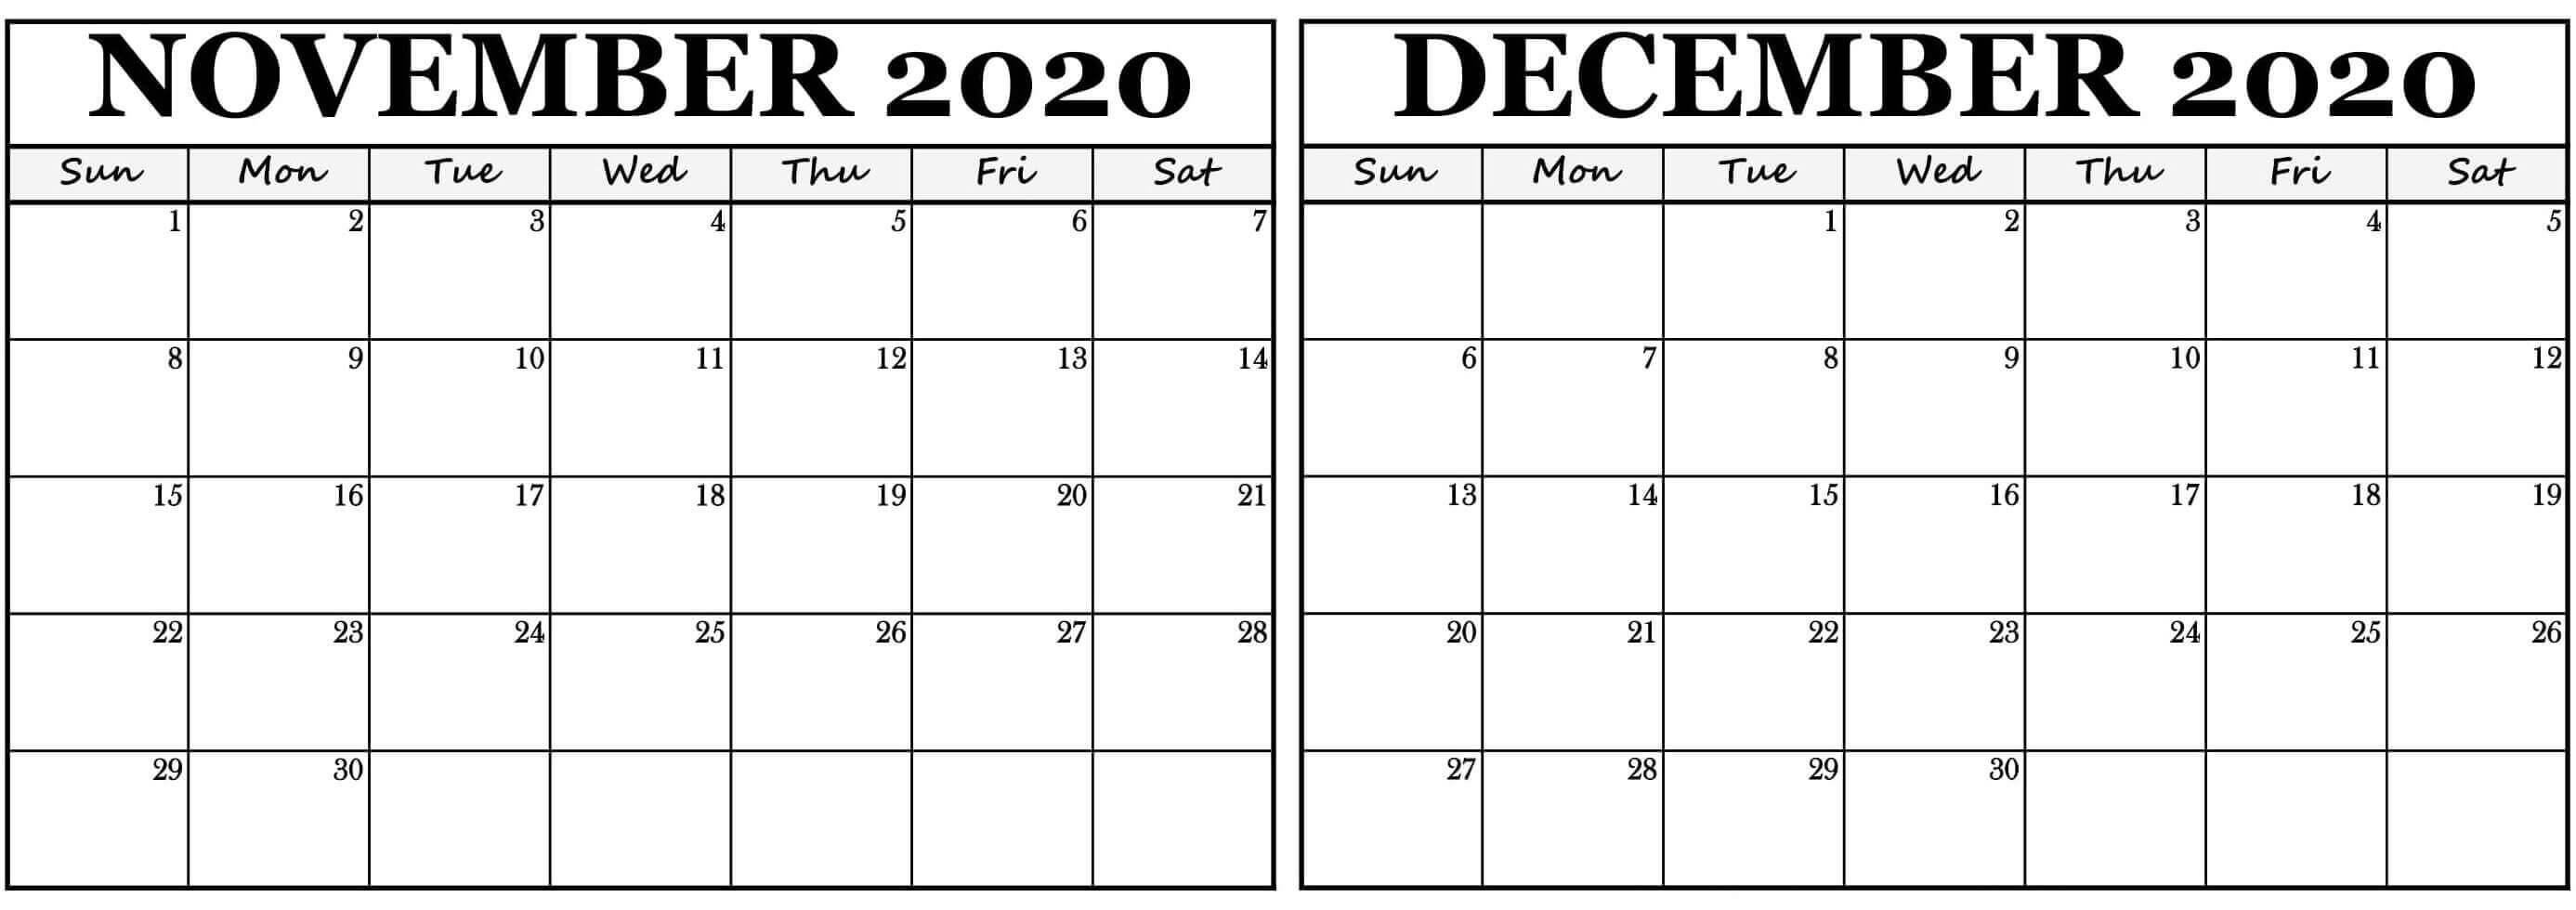 2020 November December Calendar Printable